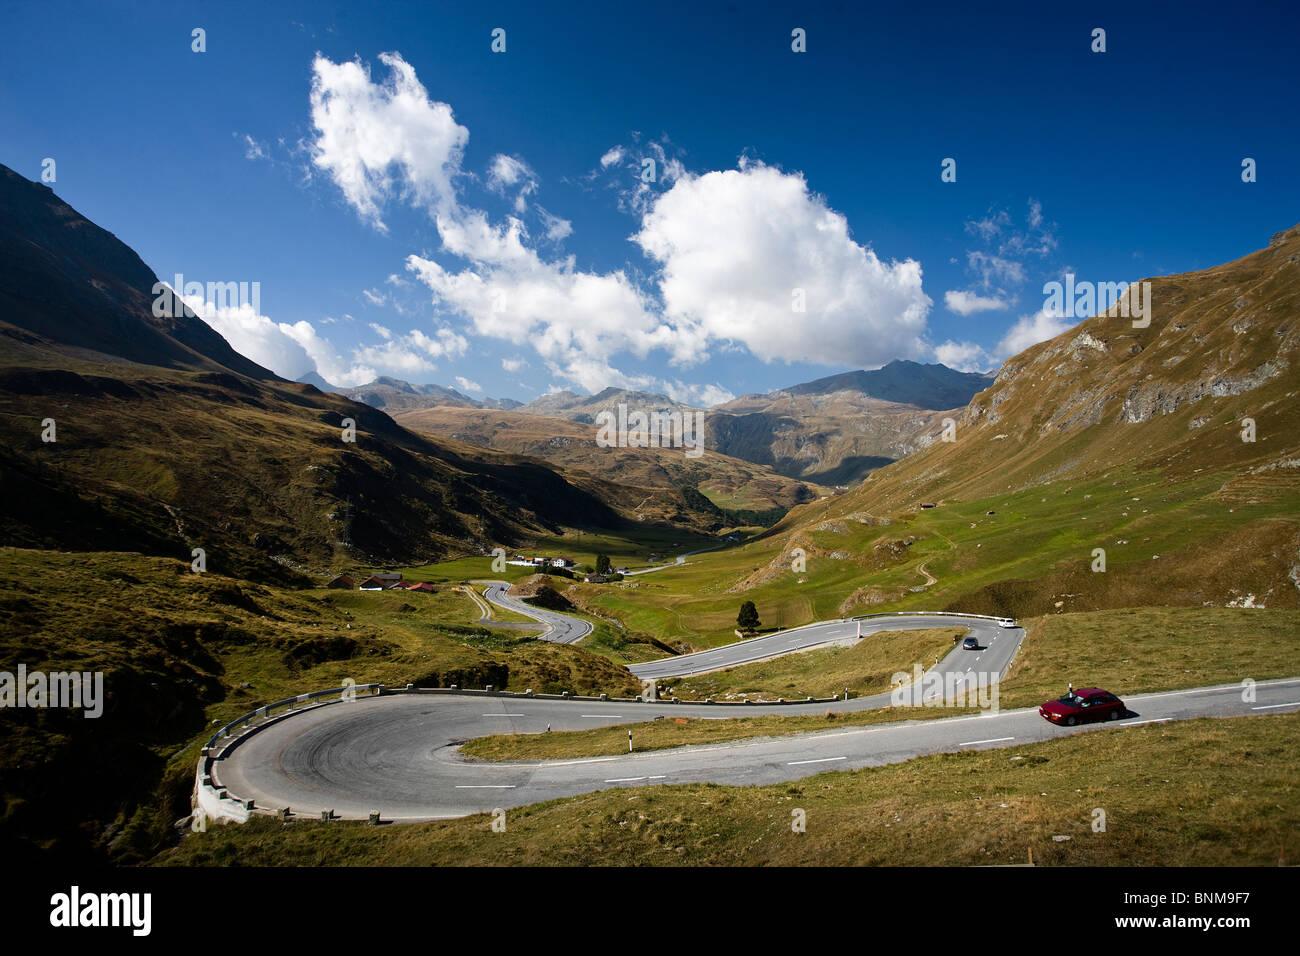 Switzerland Graubünden Grisons Engadin pass street Julier Pass sepentines curves holidays travel, - Stock Image